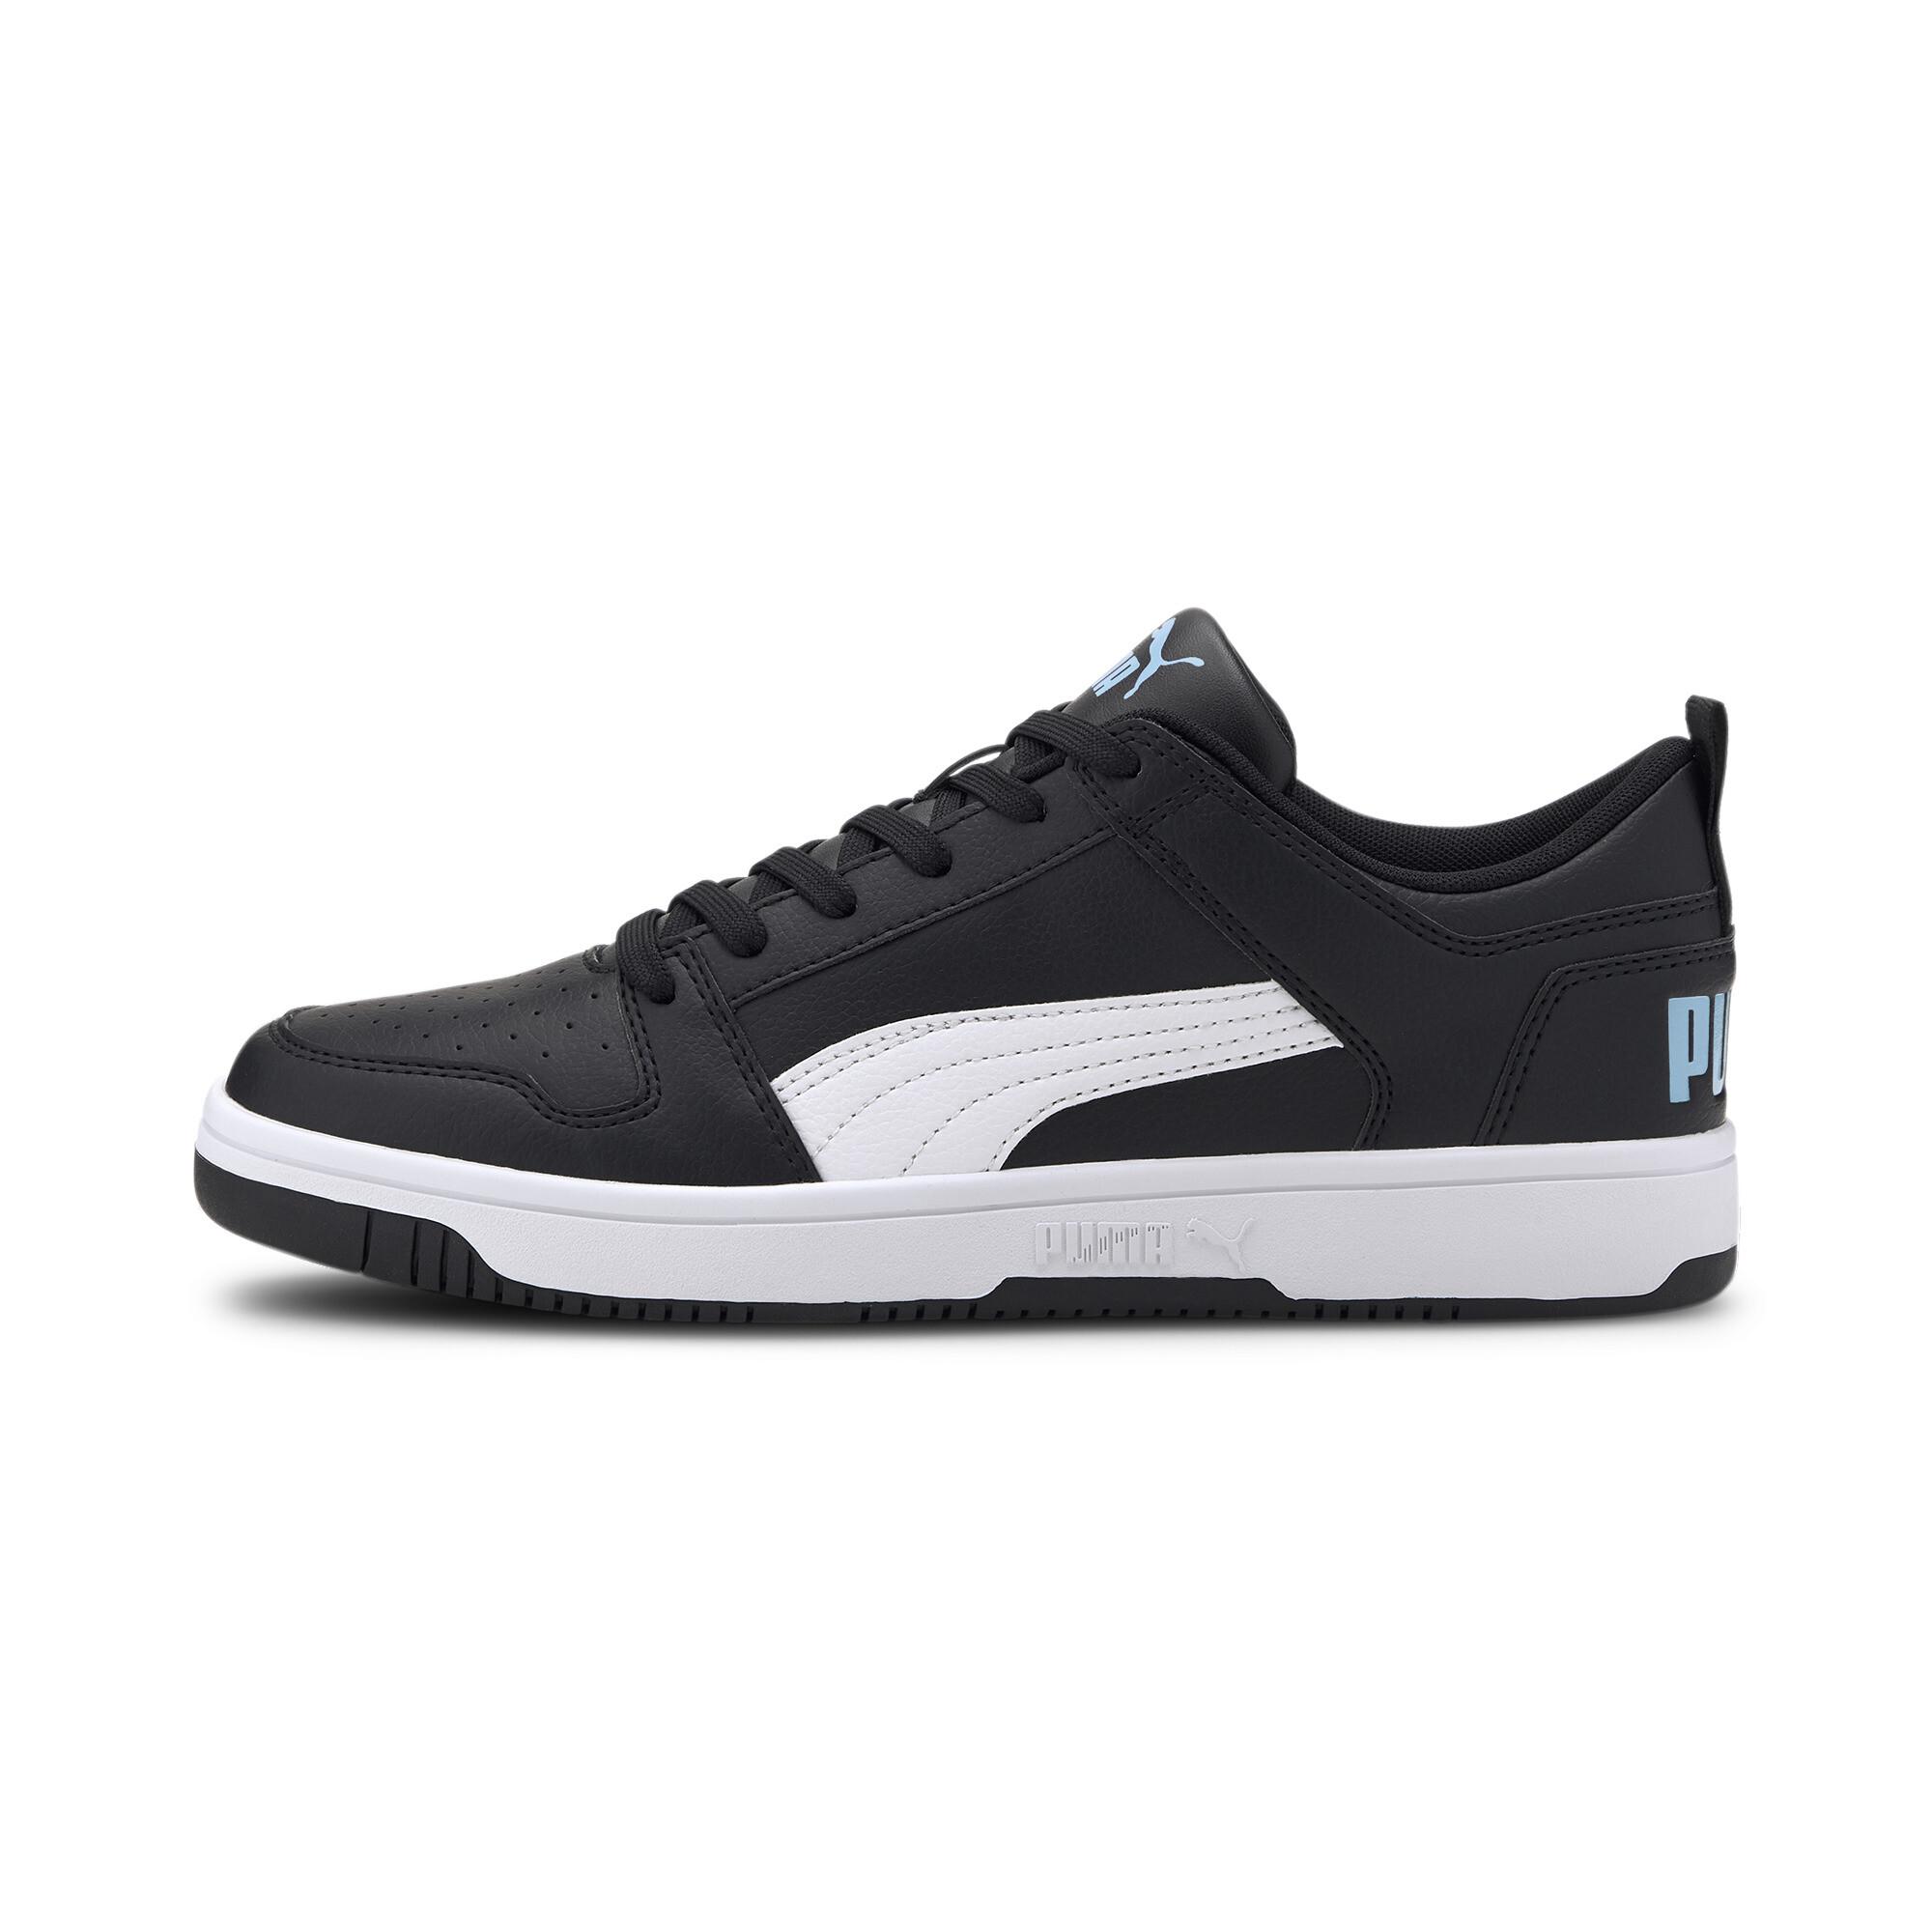 PUMA-PUMA-Rebound-LayUp-Lo-Men-039-s-Sneakers-Men-Shoe-Basics miniatura 23